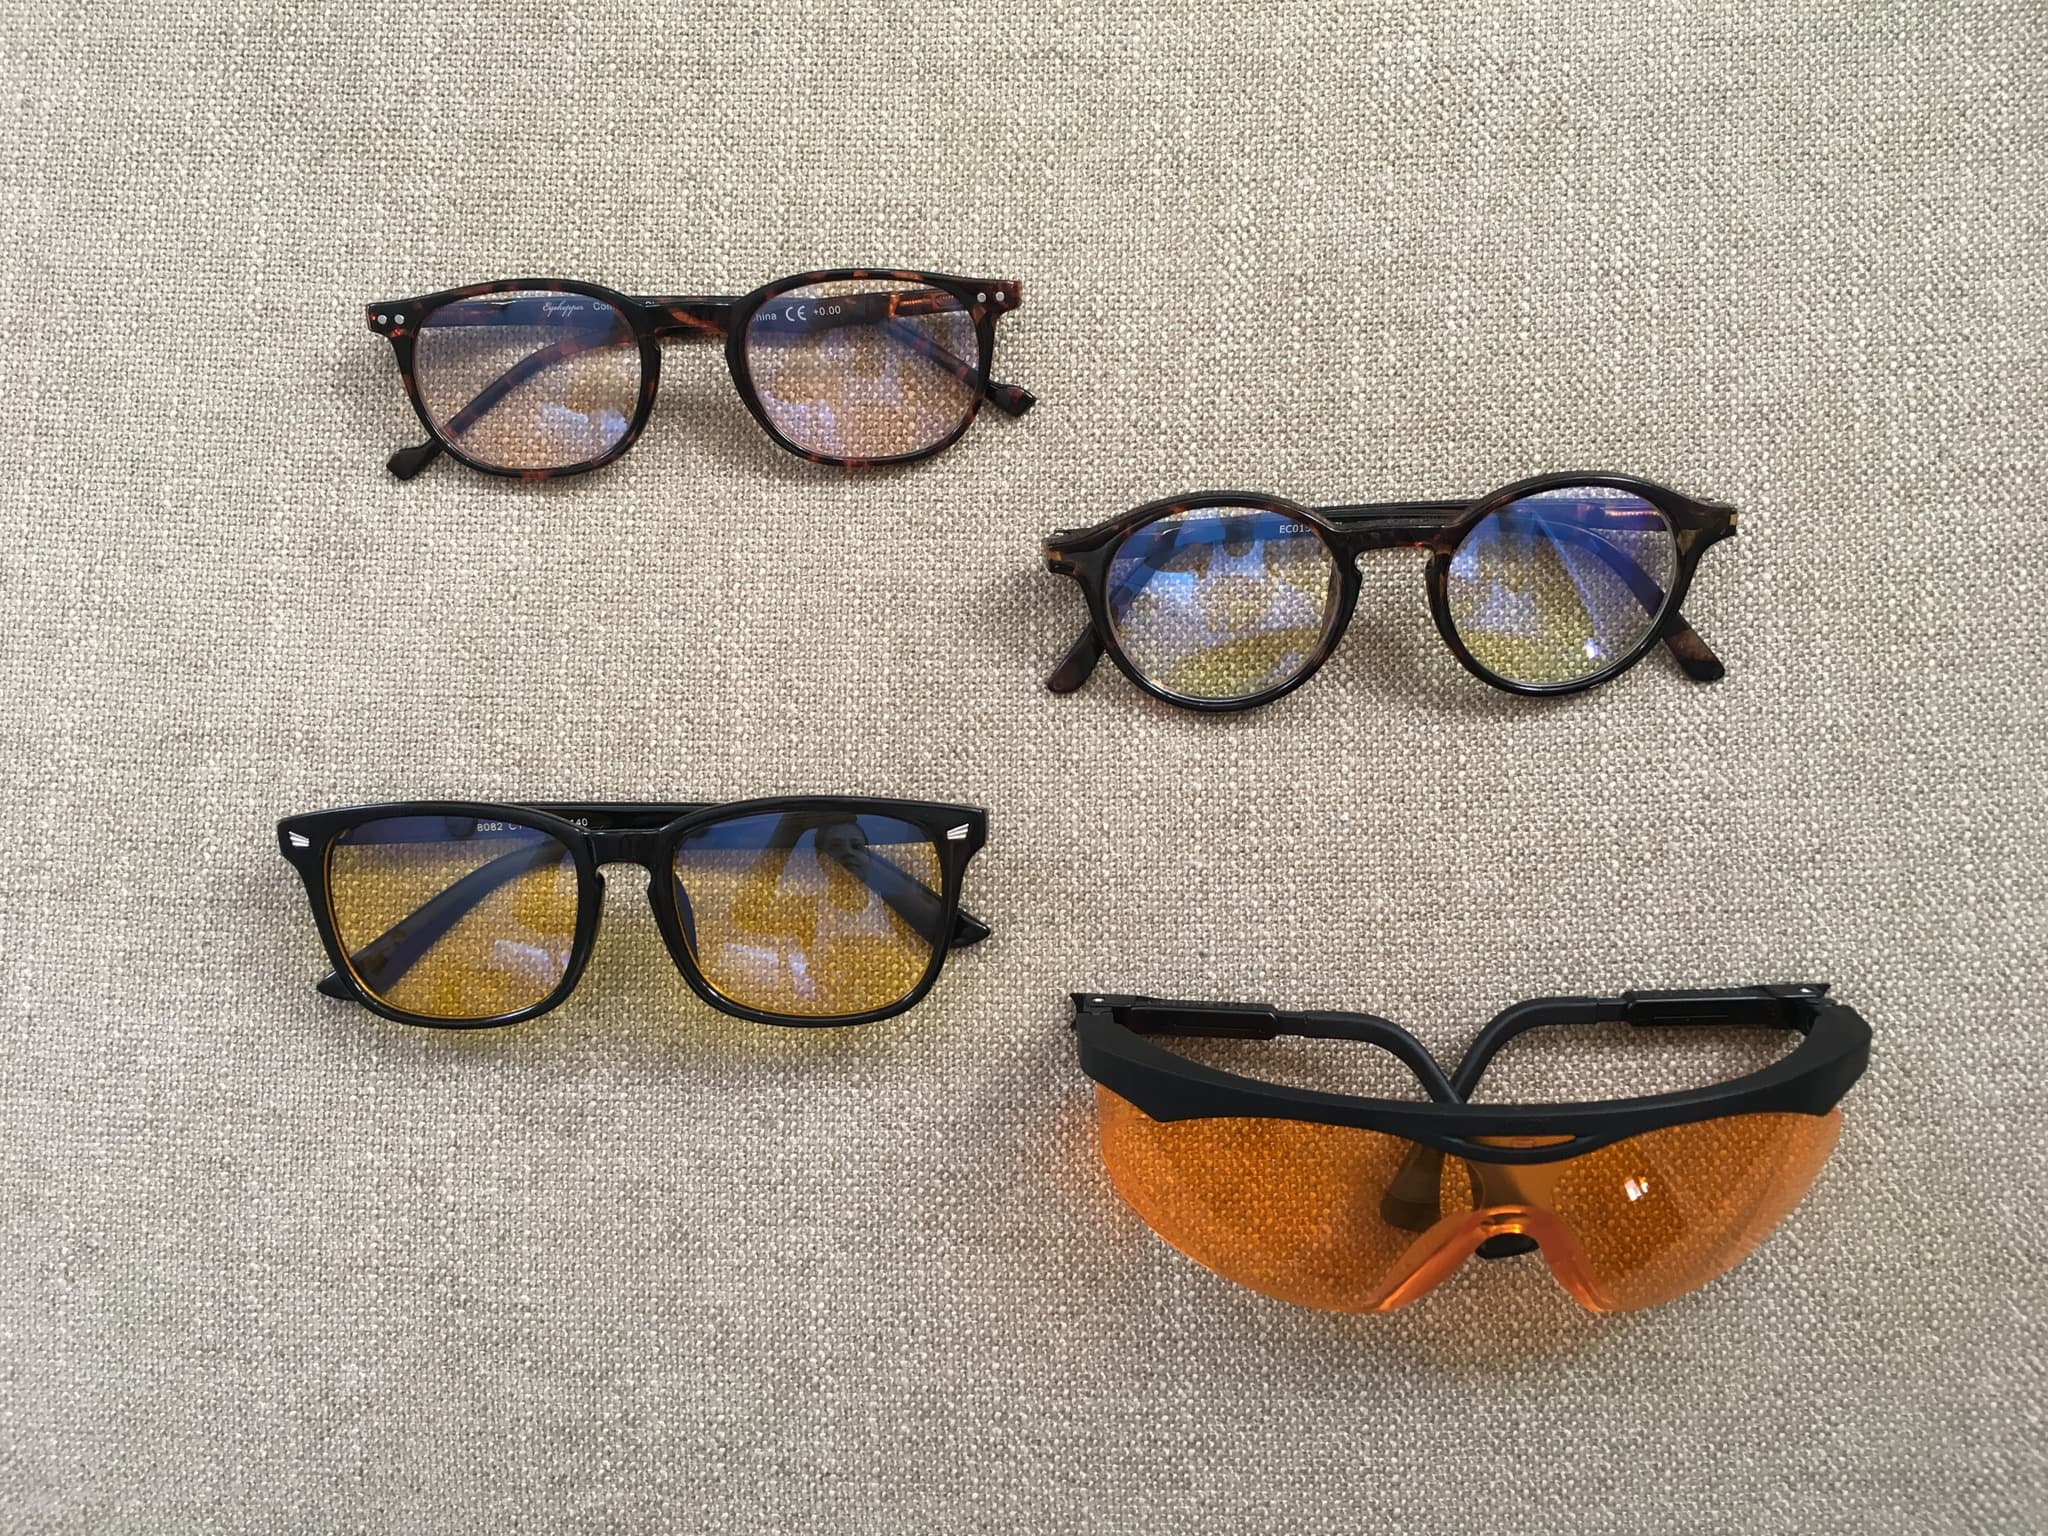 548298492b11 Best Blue Light Blocking Glasses - All Your Options